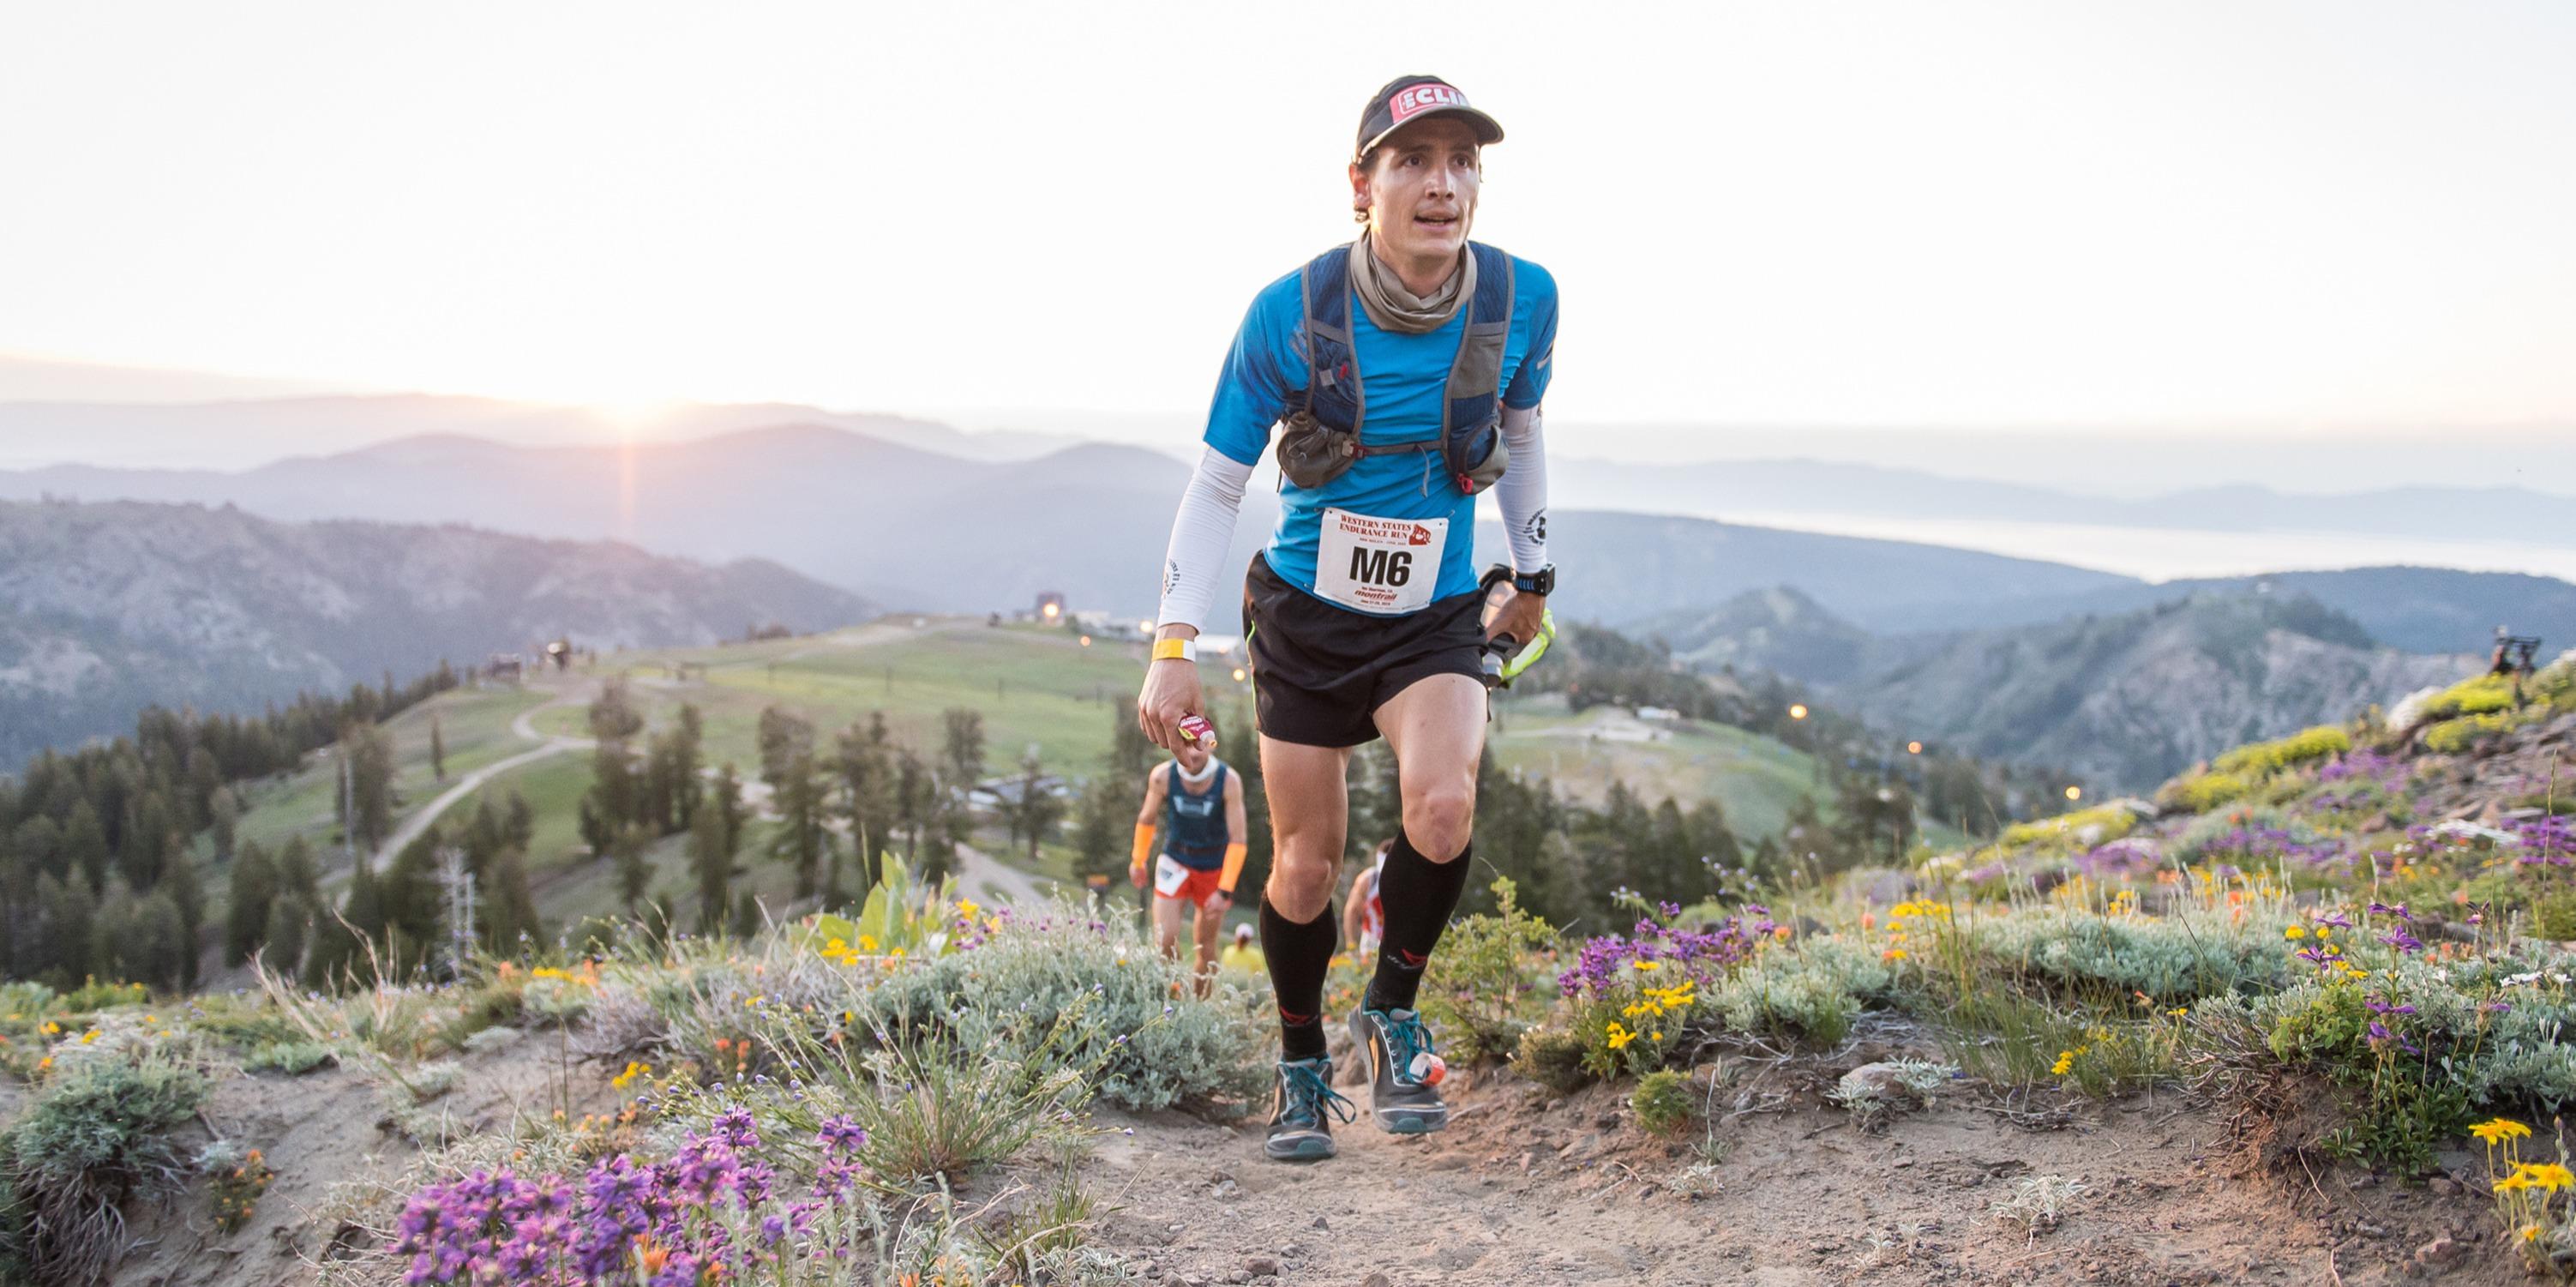 Triathlon For Beginners: How Do I Train For My First Triathlon?